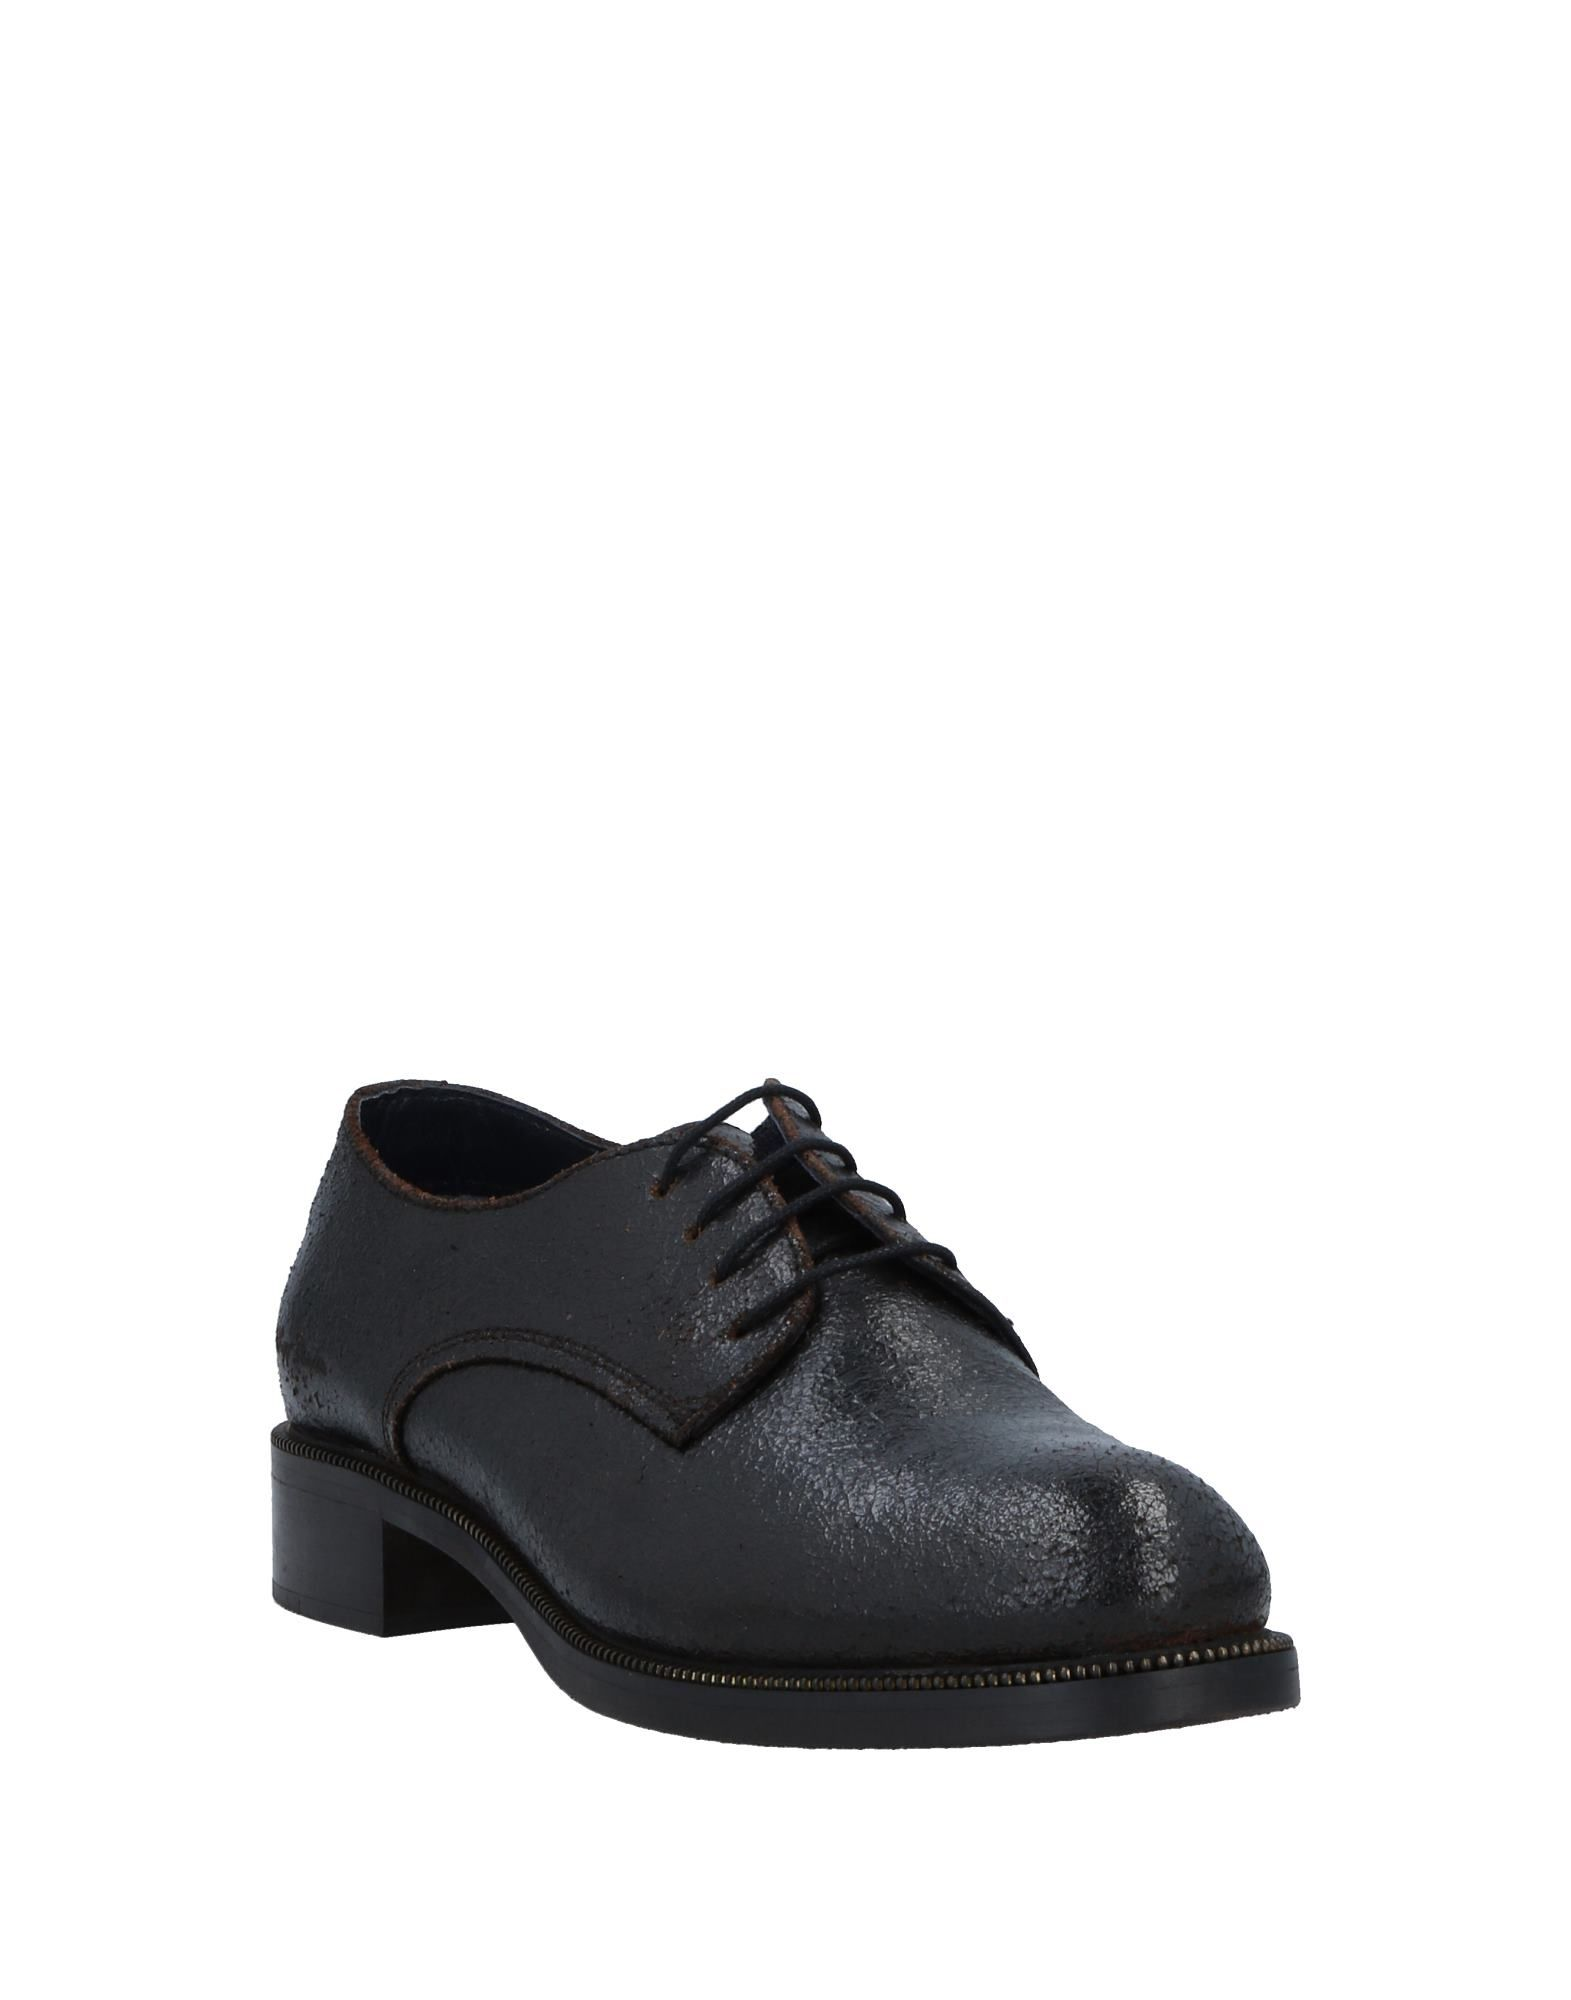 ... Rabatt echte Schuhe Tommy Jeans Schnürschuhe Herren Schuhe 11523334OJ  e5c3dc ... 9fcbc5f915